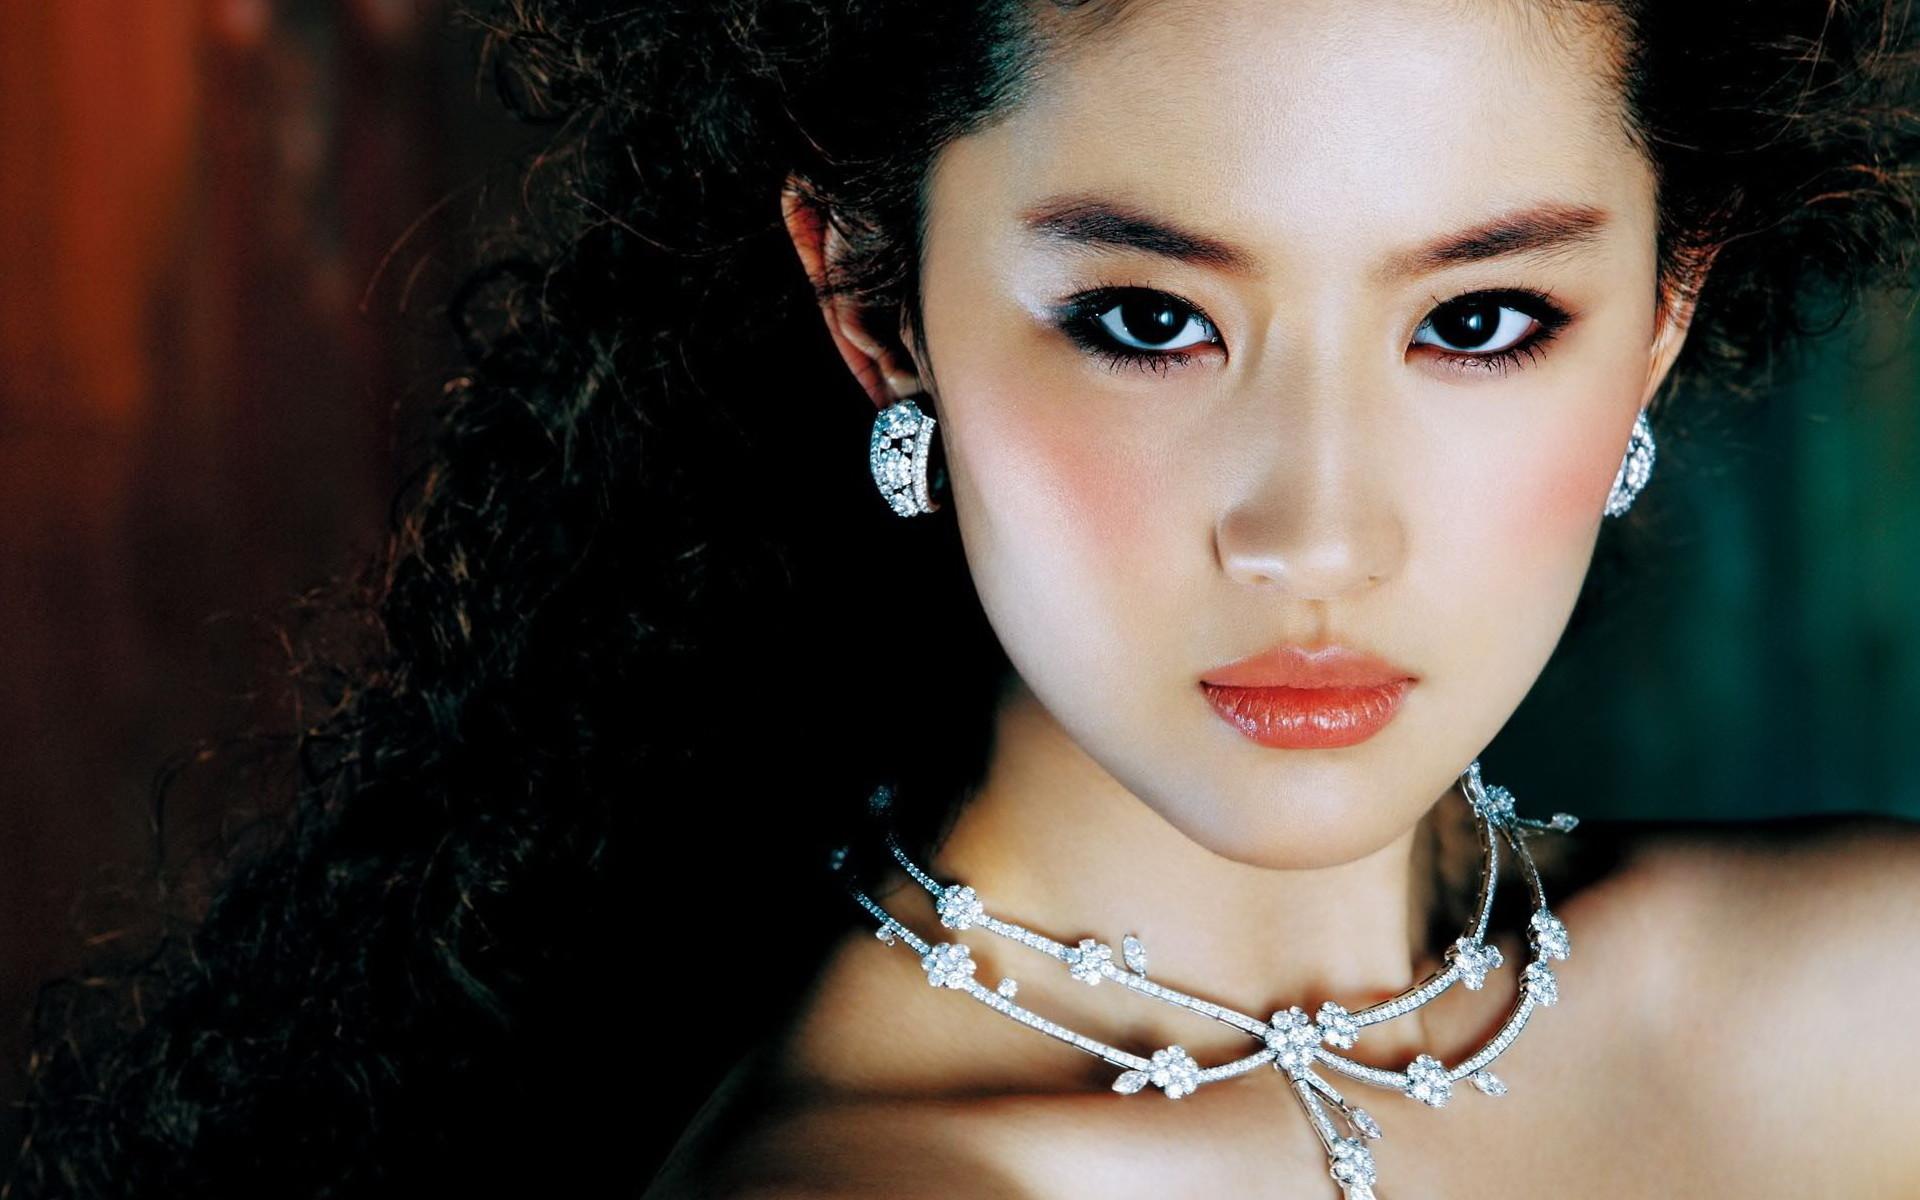 Description: Beautiful Girl Wallpapers HD is a hi res Wallpaper for pc .